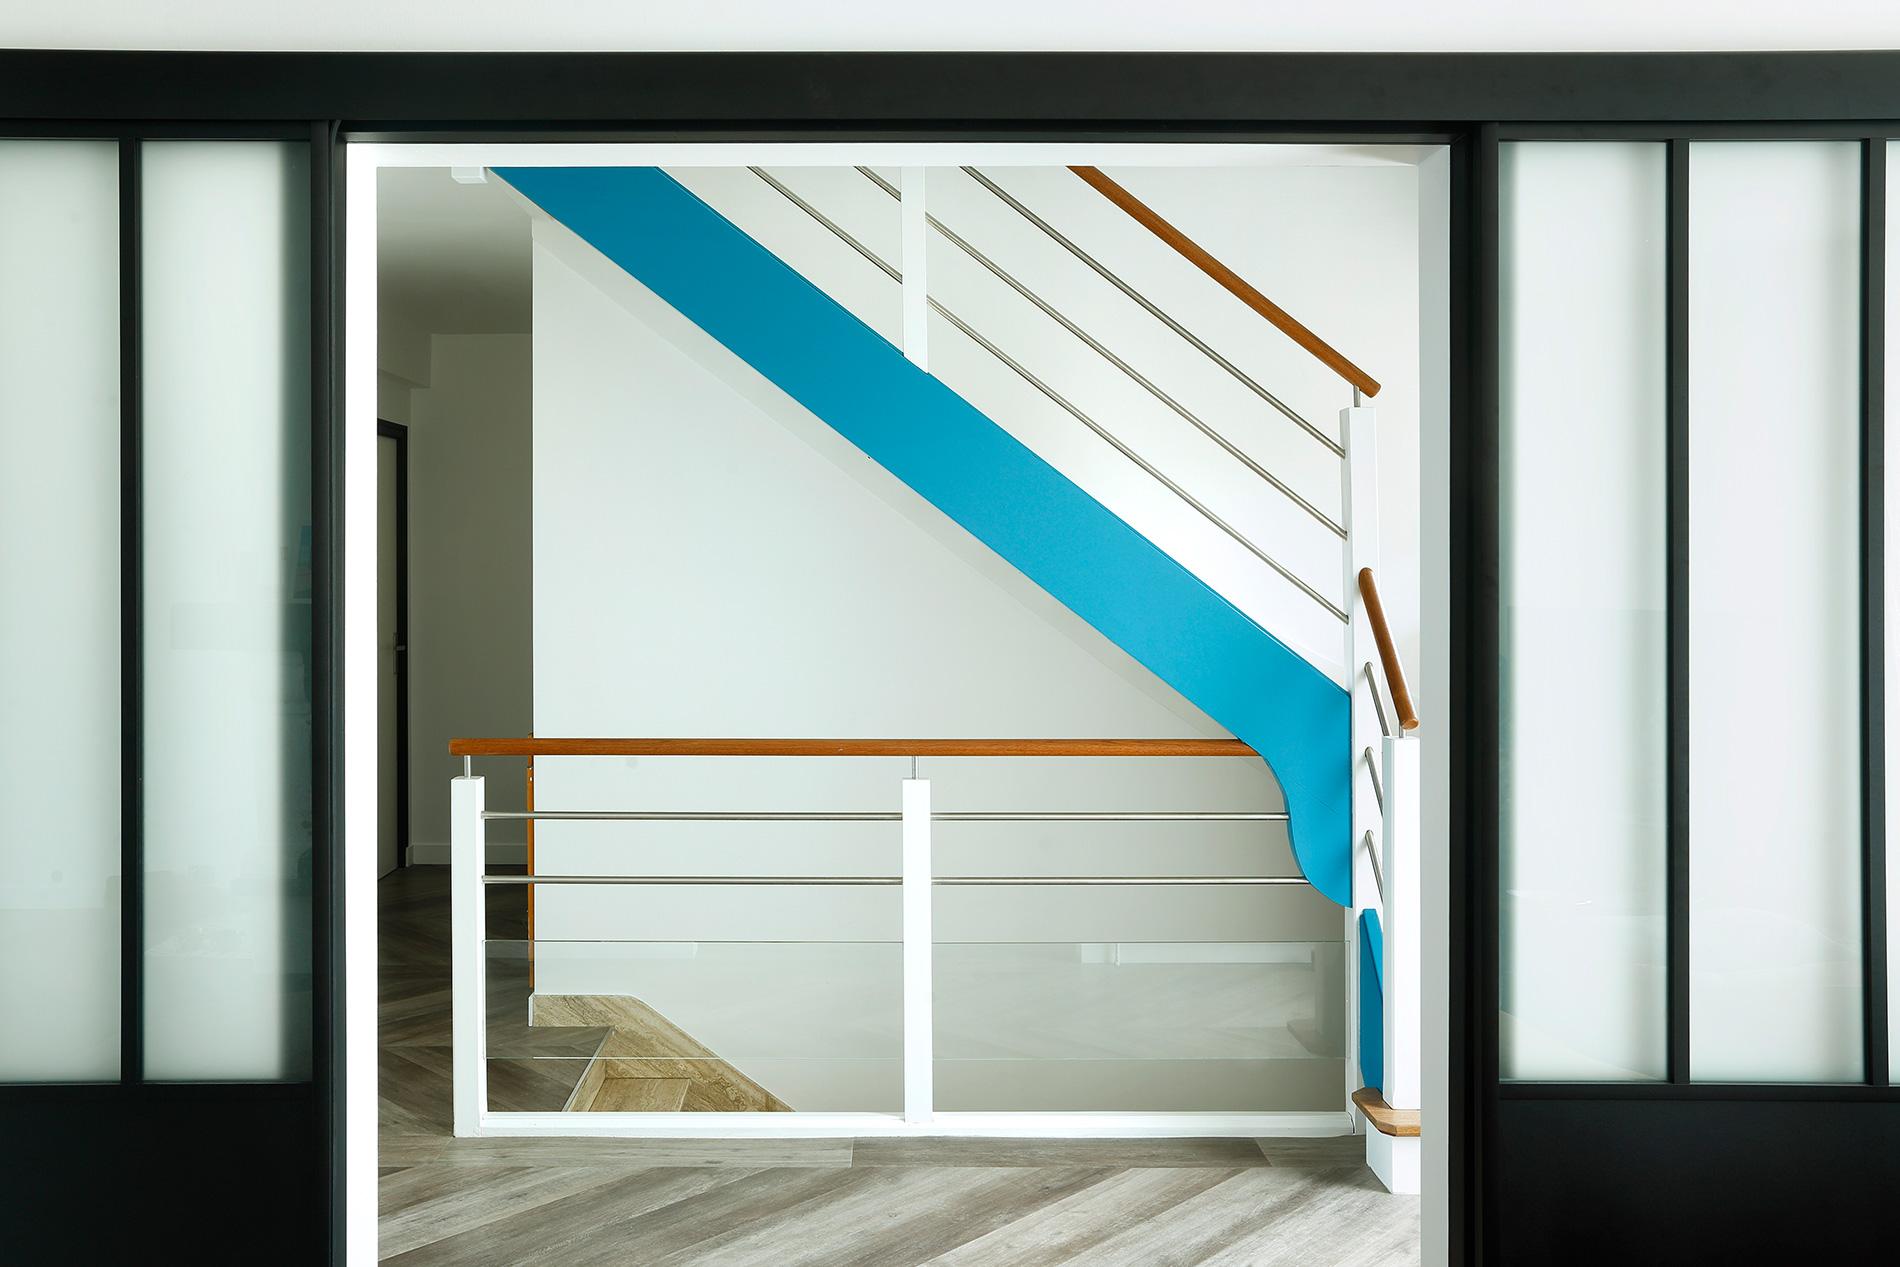 Image de Escaliers